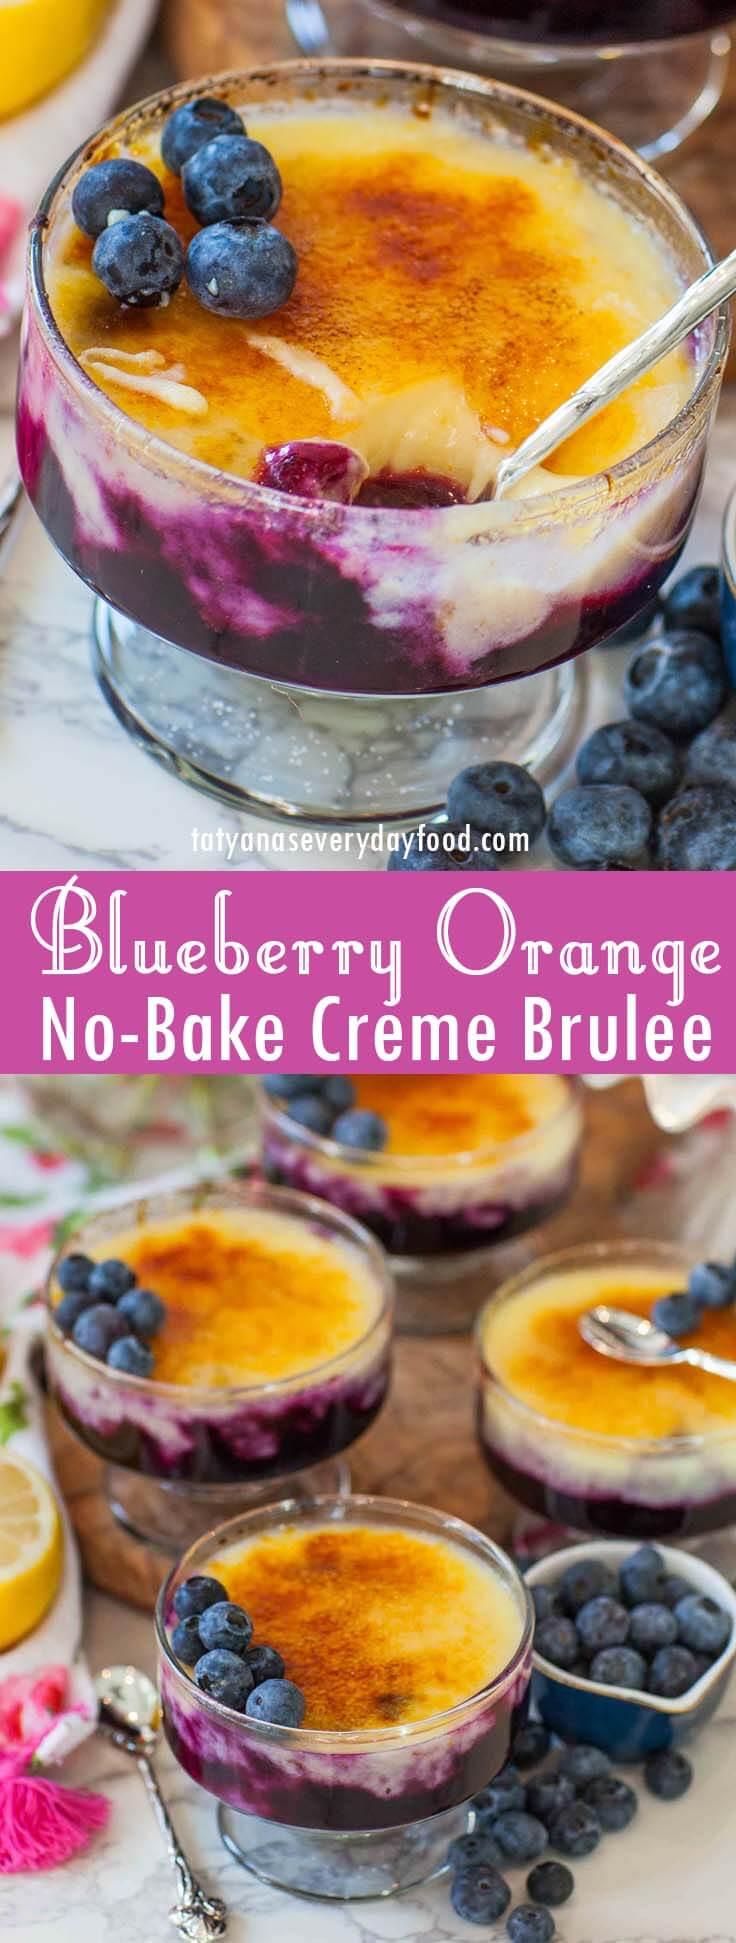 No-Bake Blueberry Orange Creme Brulee video recipe